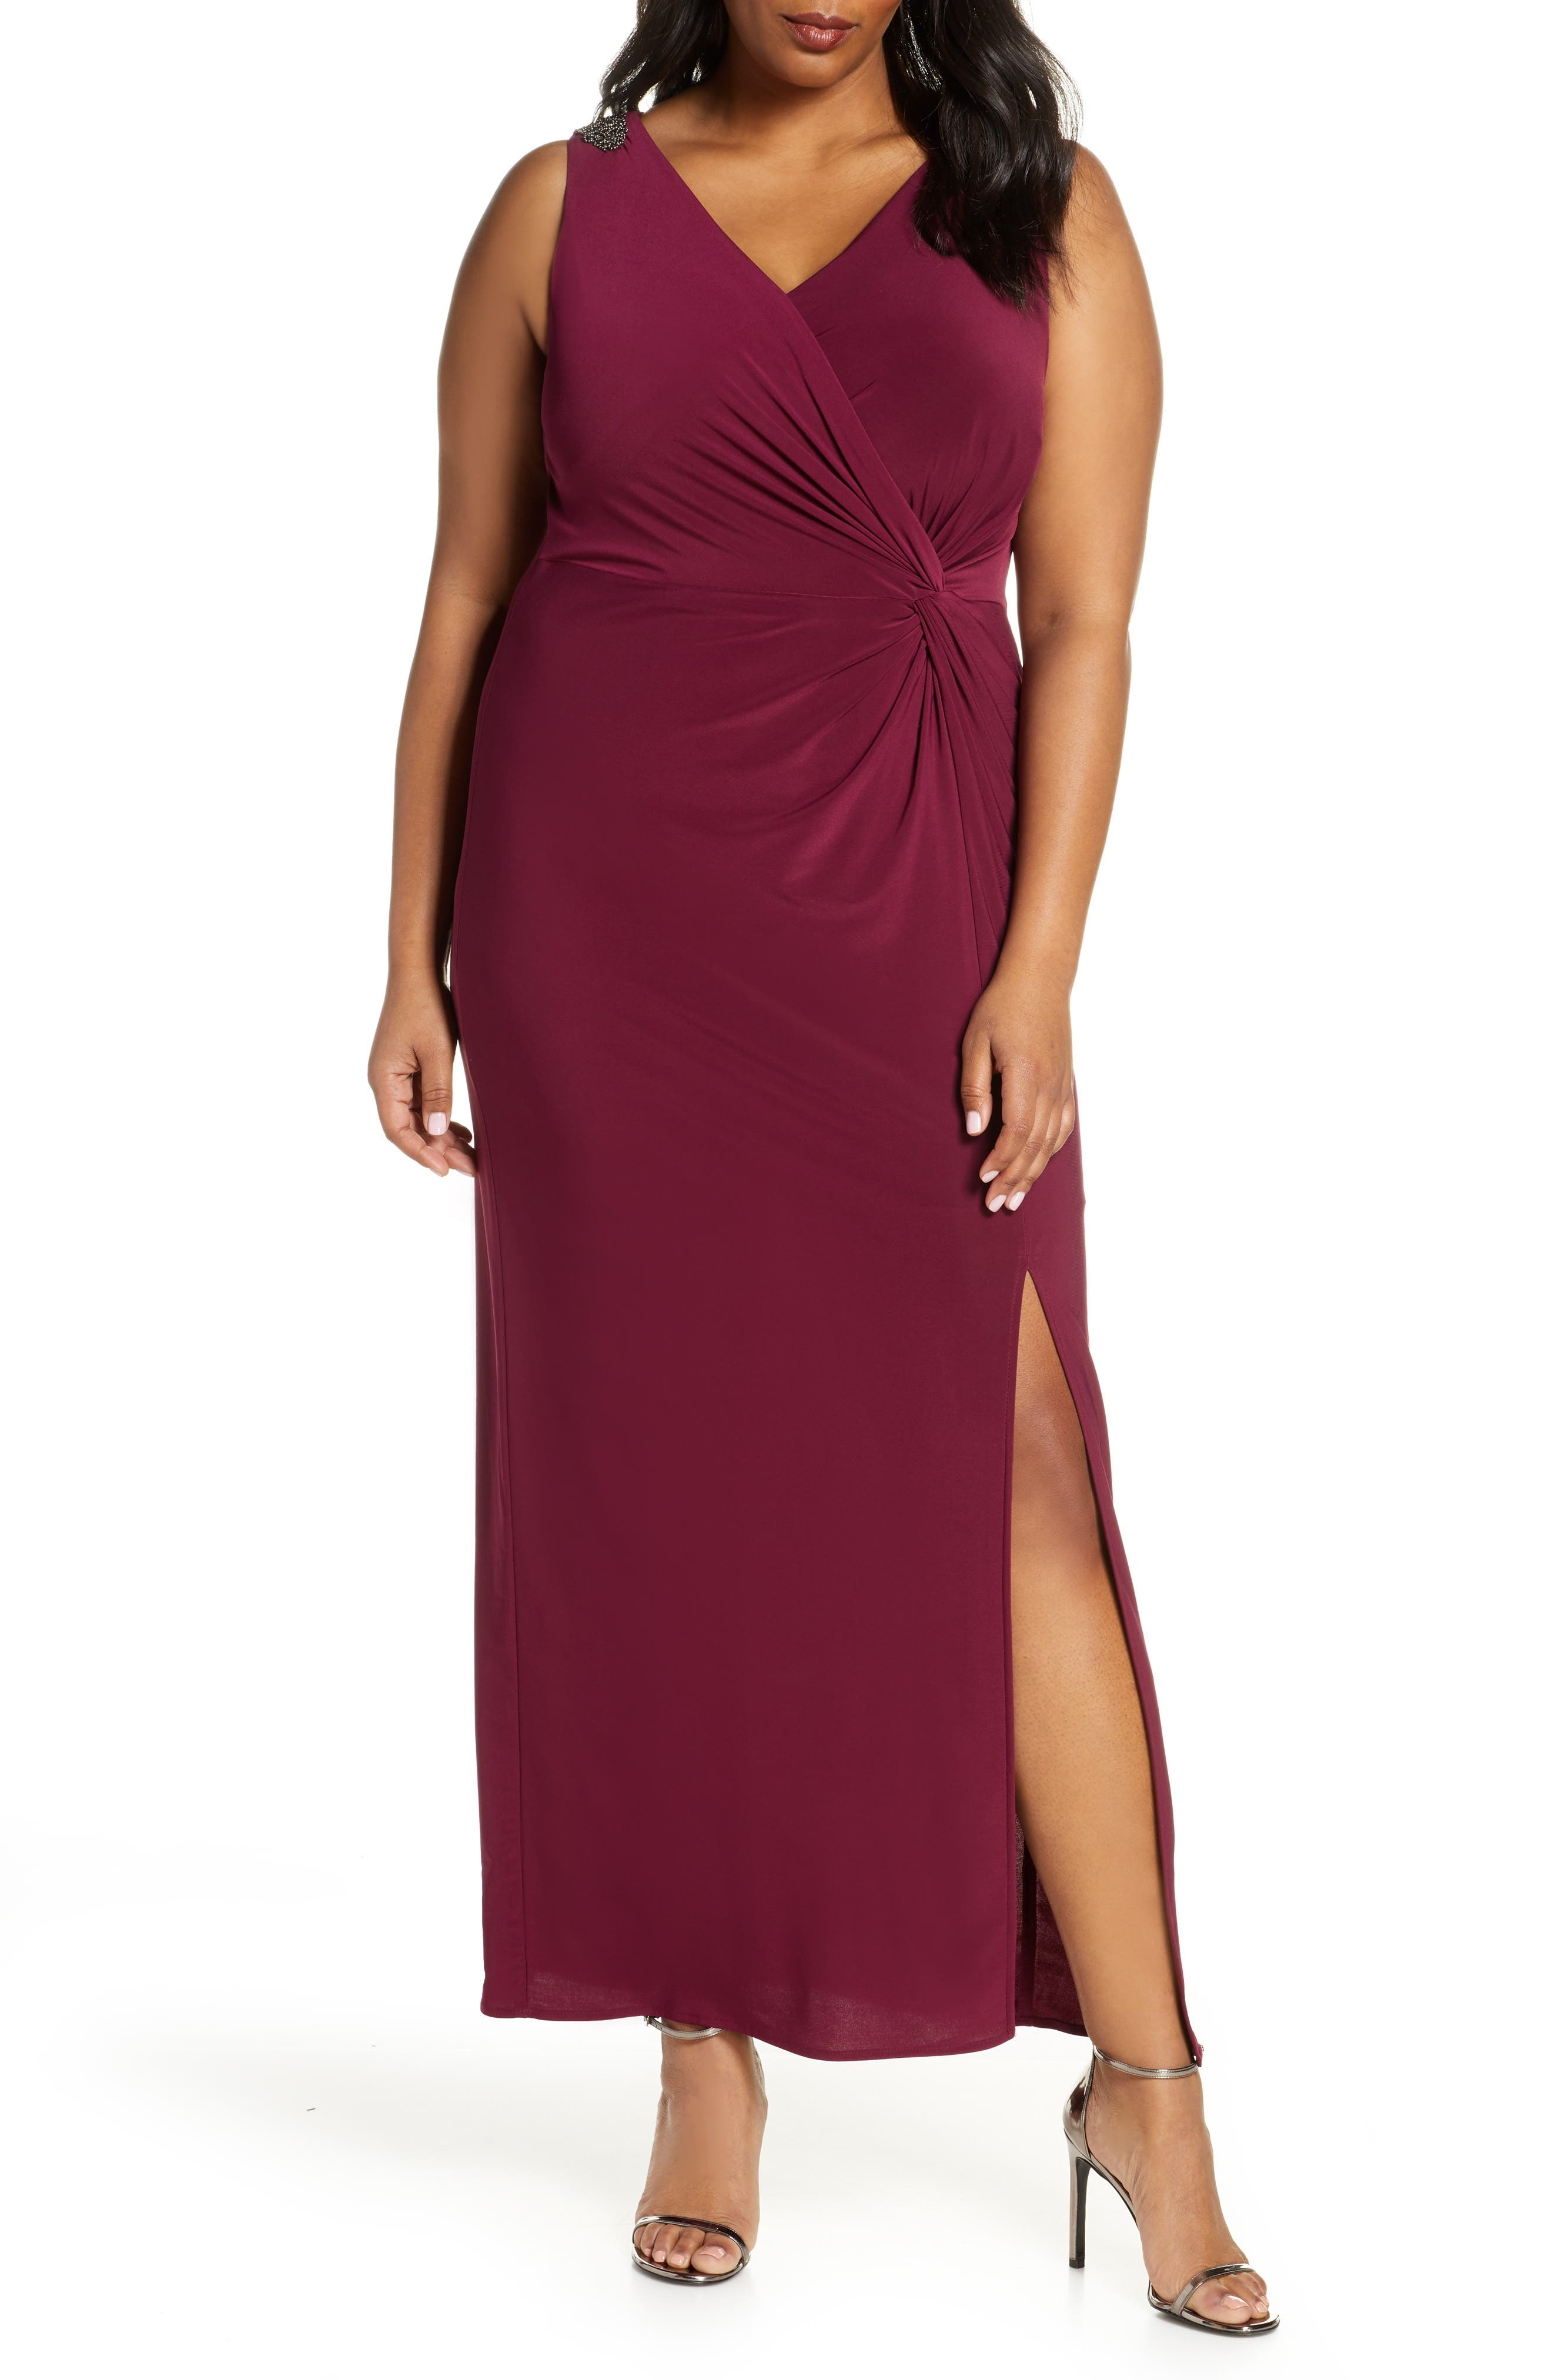 Plus Size Alex Evenings Jeweled Shoulder Twist Front Gown, Burgundy